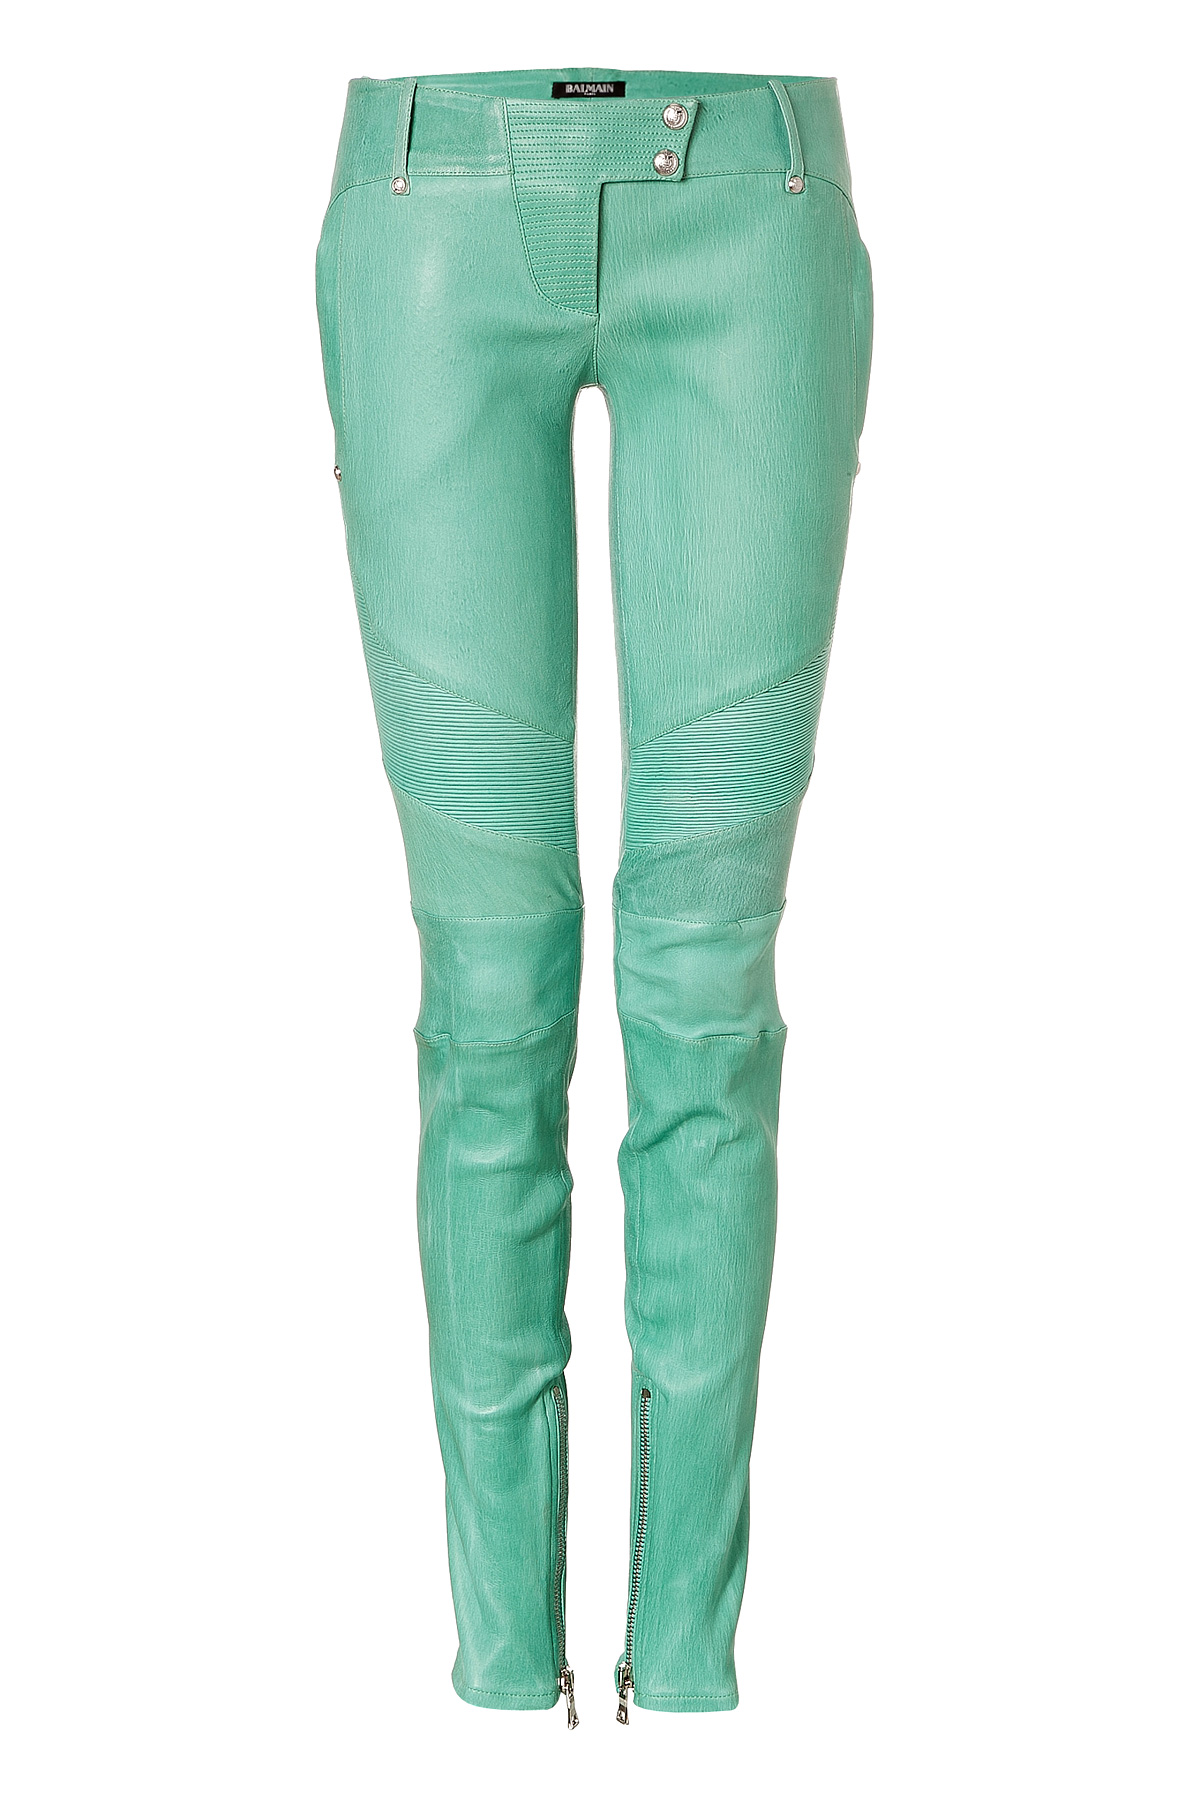 rag & bone/JEAN Skinny Leather Ankle Pants, Black Details rag & bone/JEAN washed lamb leather pants. Approx. measurements: 30